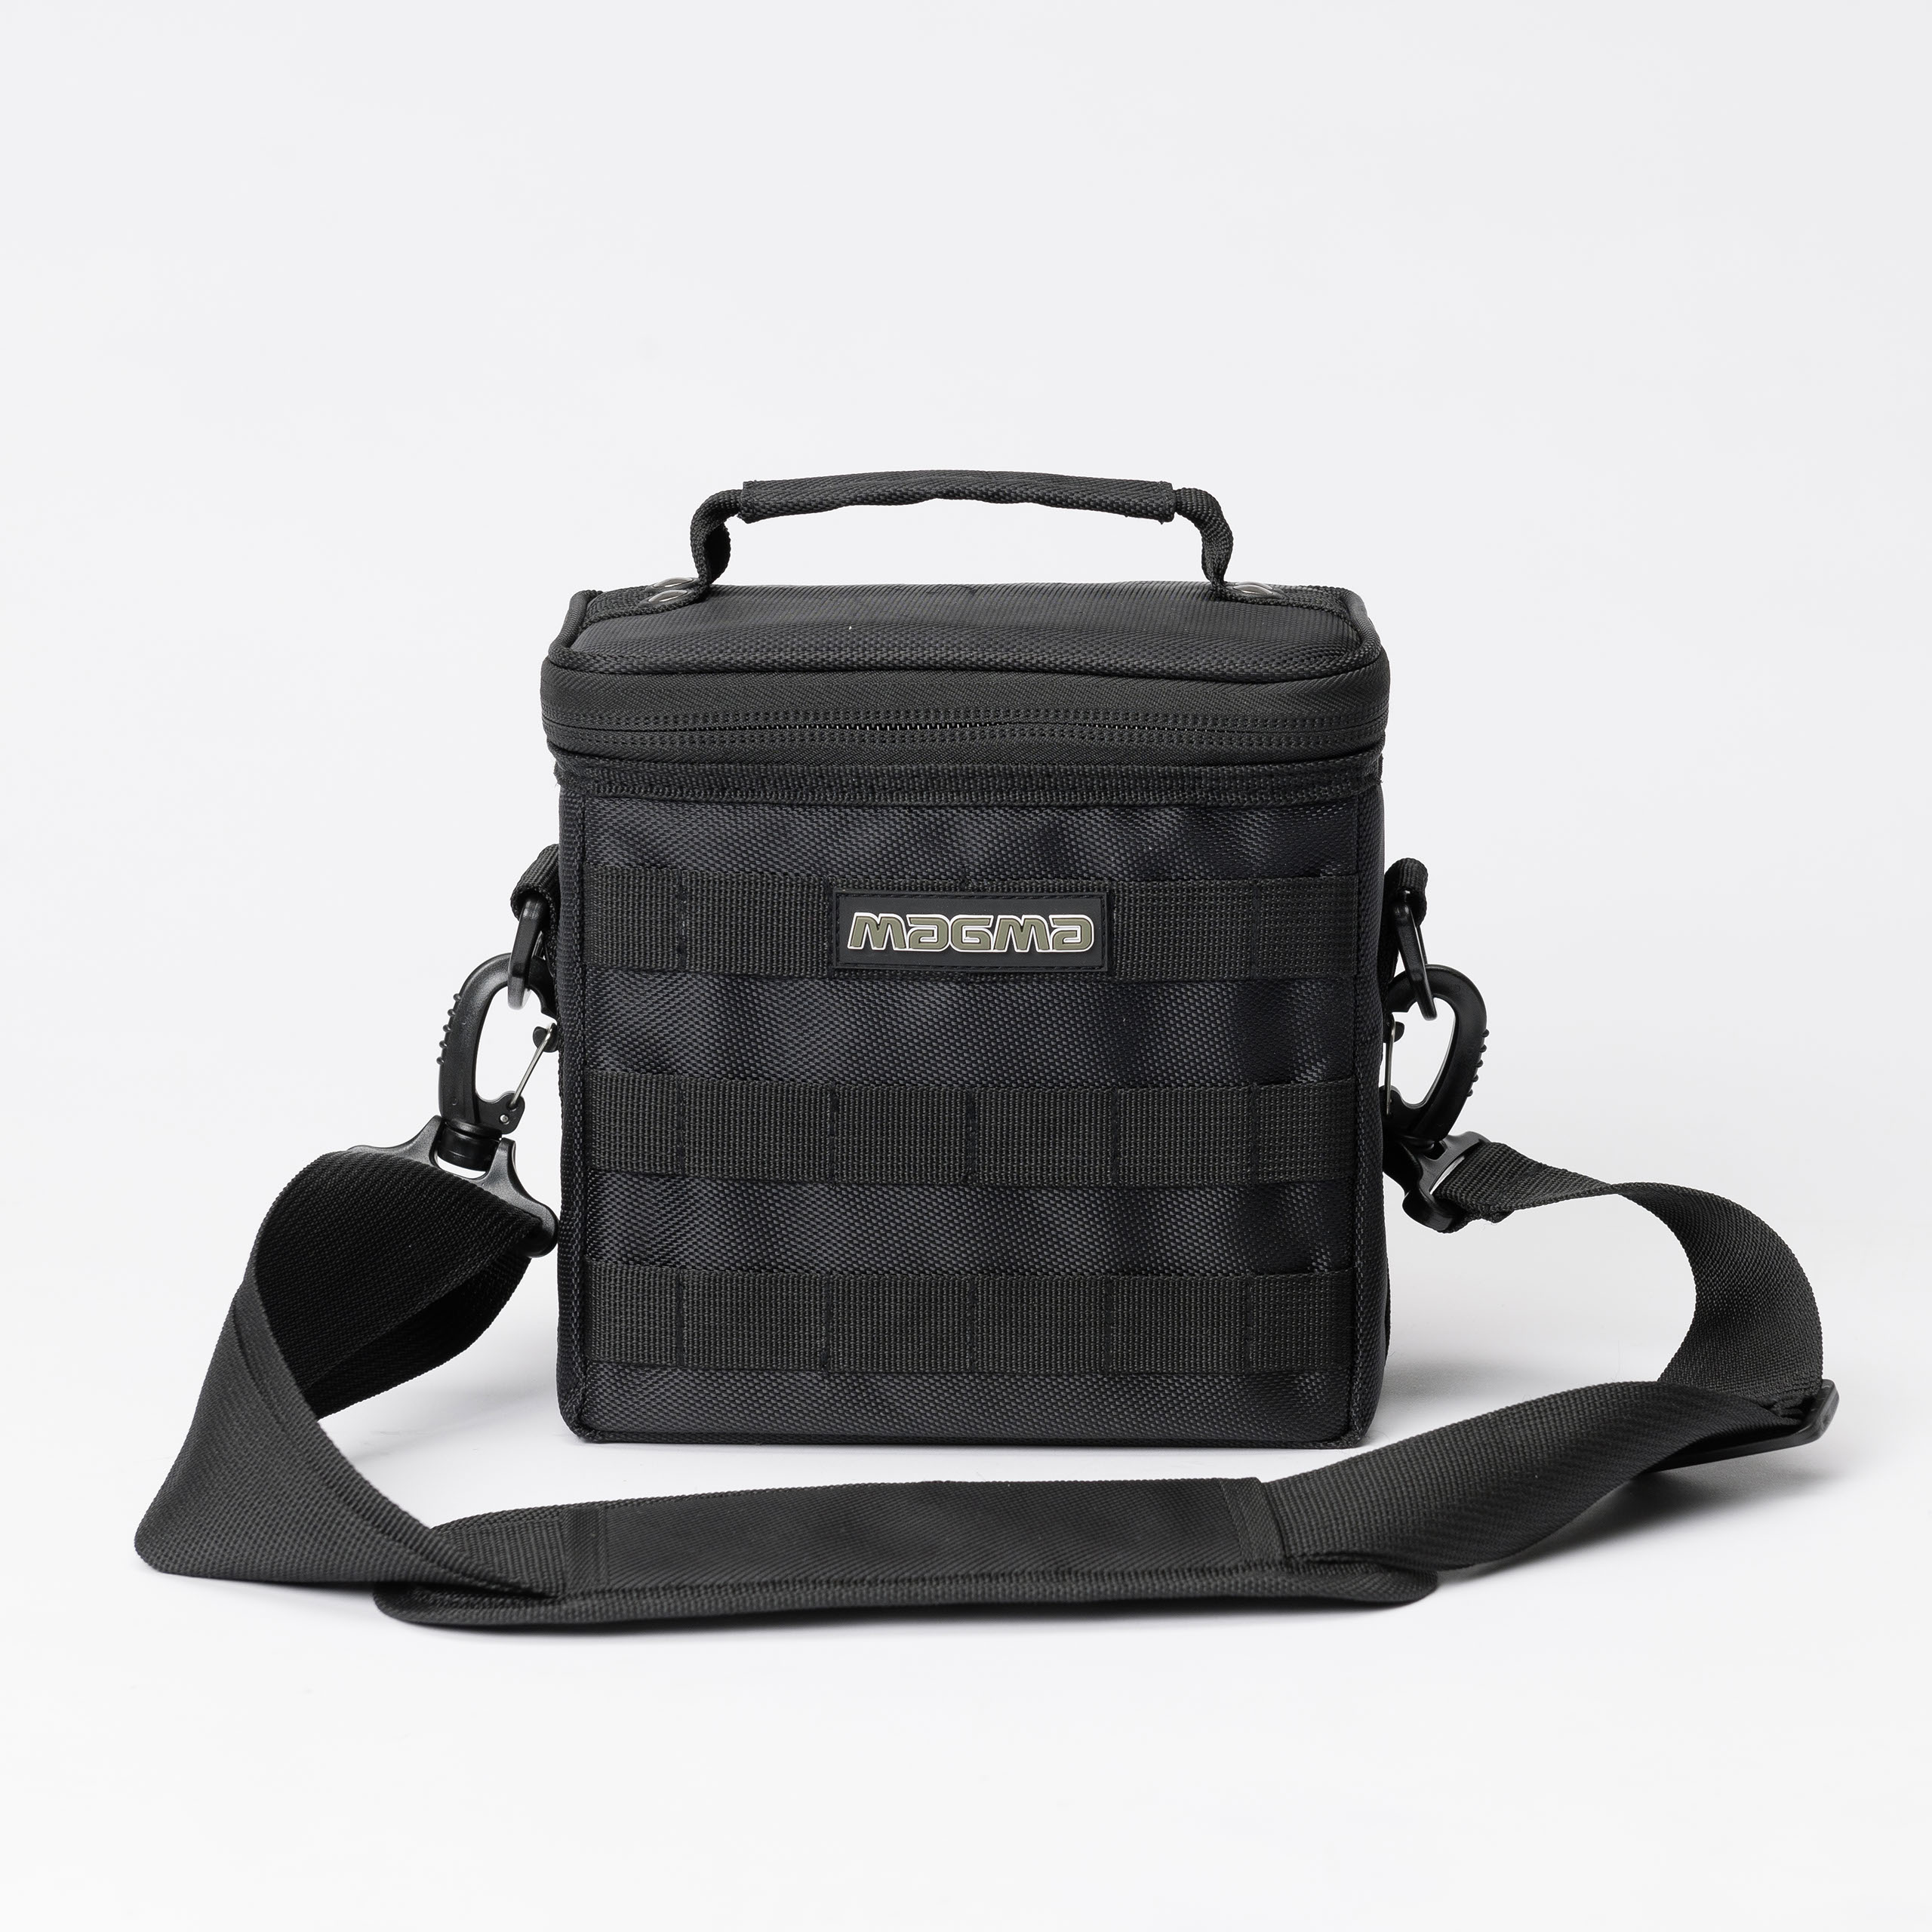 Magma-bags 45 Record-Bag 50